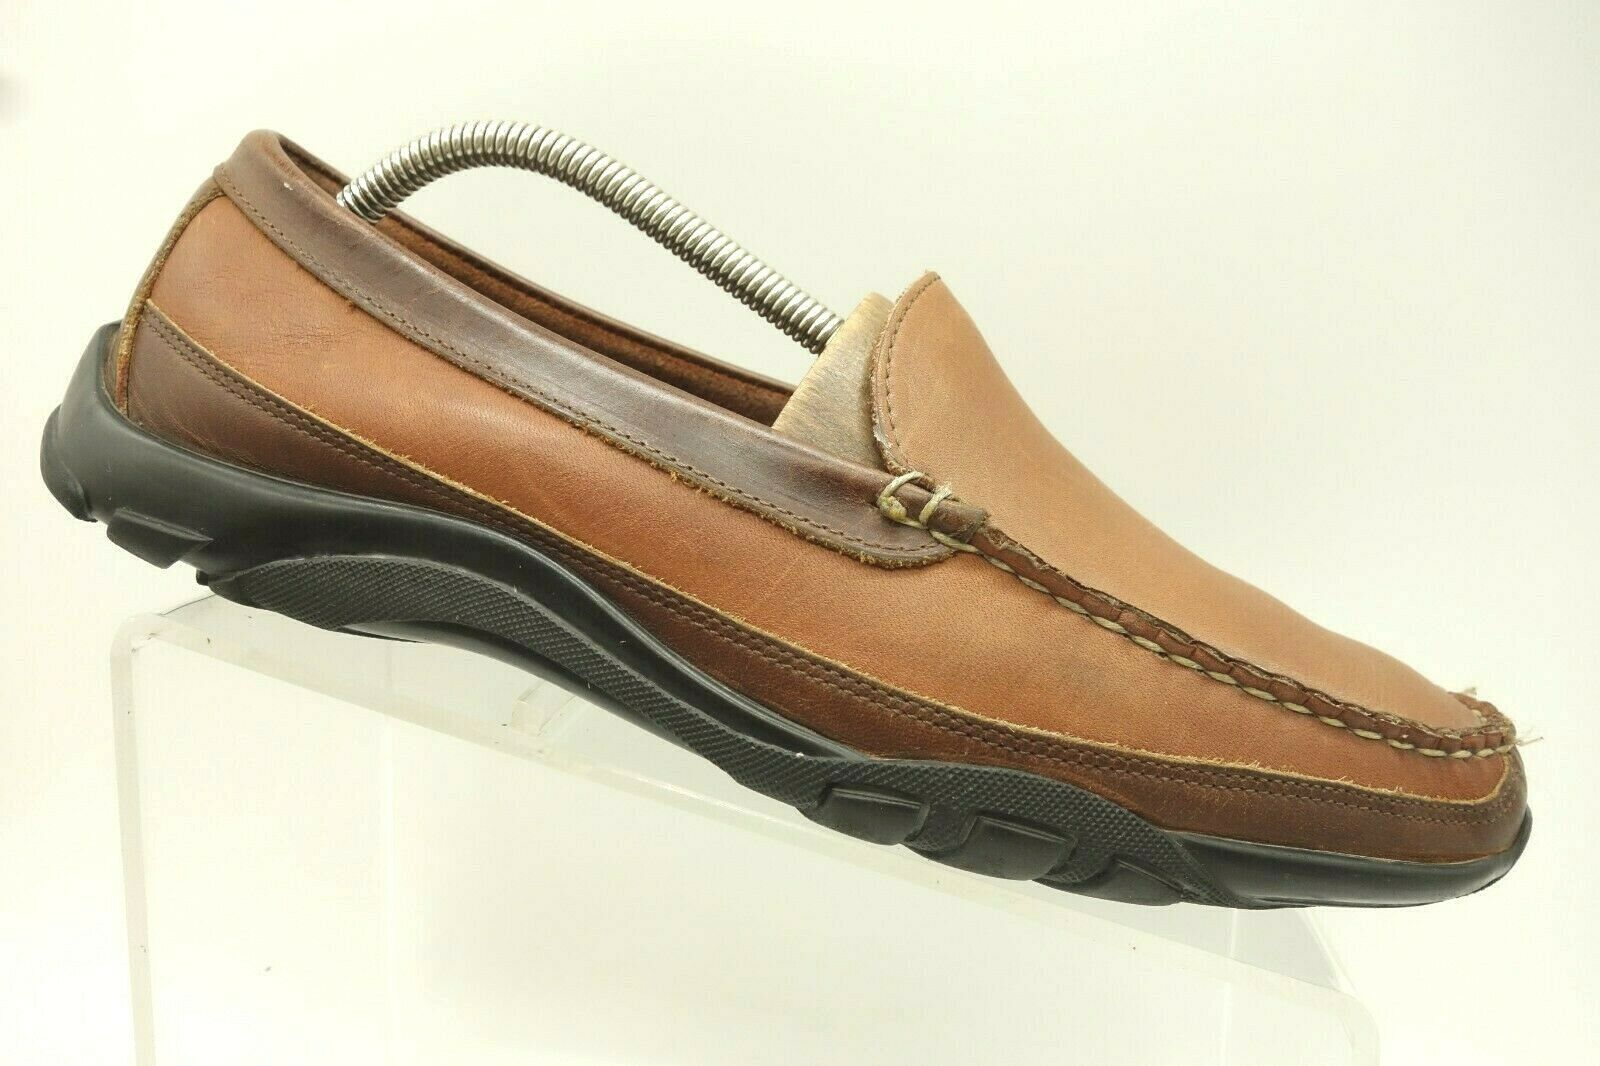 Allen Edmonds Boulder Brown Leather Slip On Casual Loafers shoes Men's 9.5 D